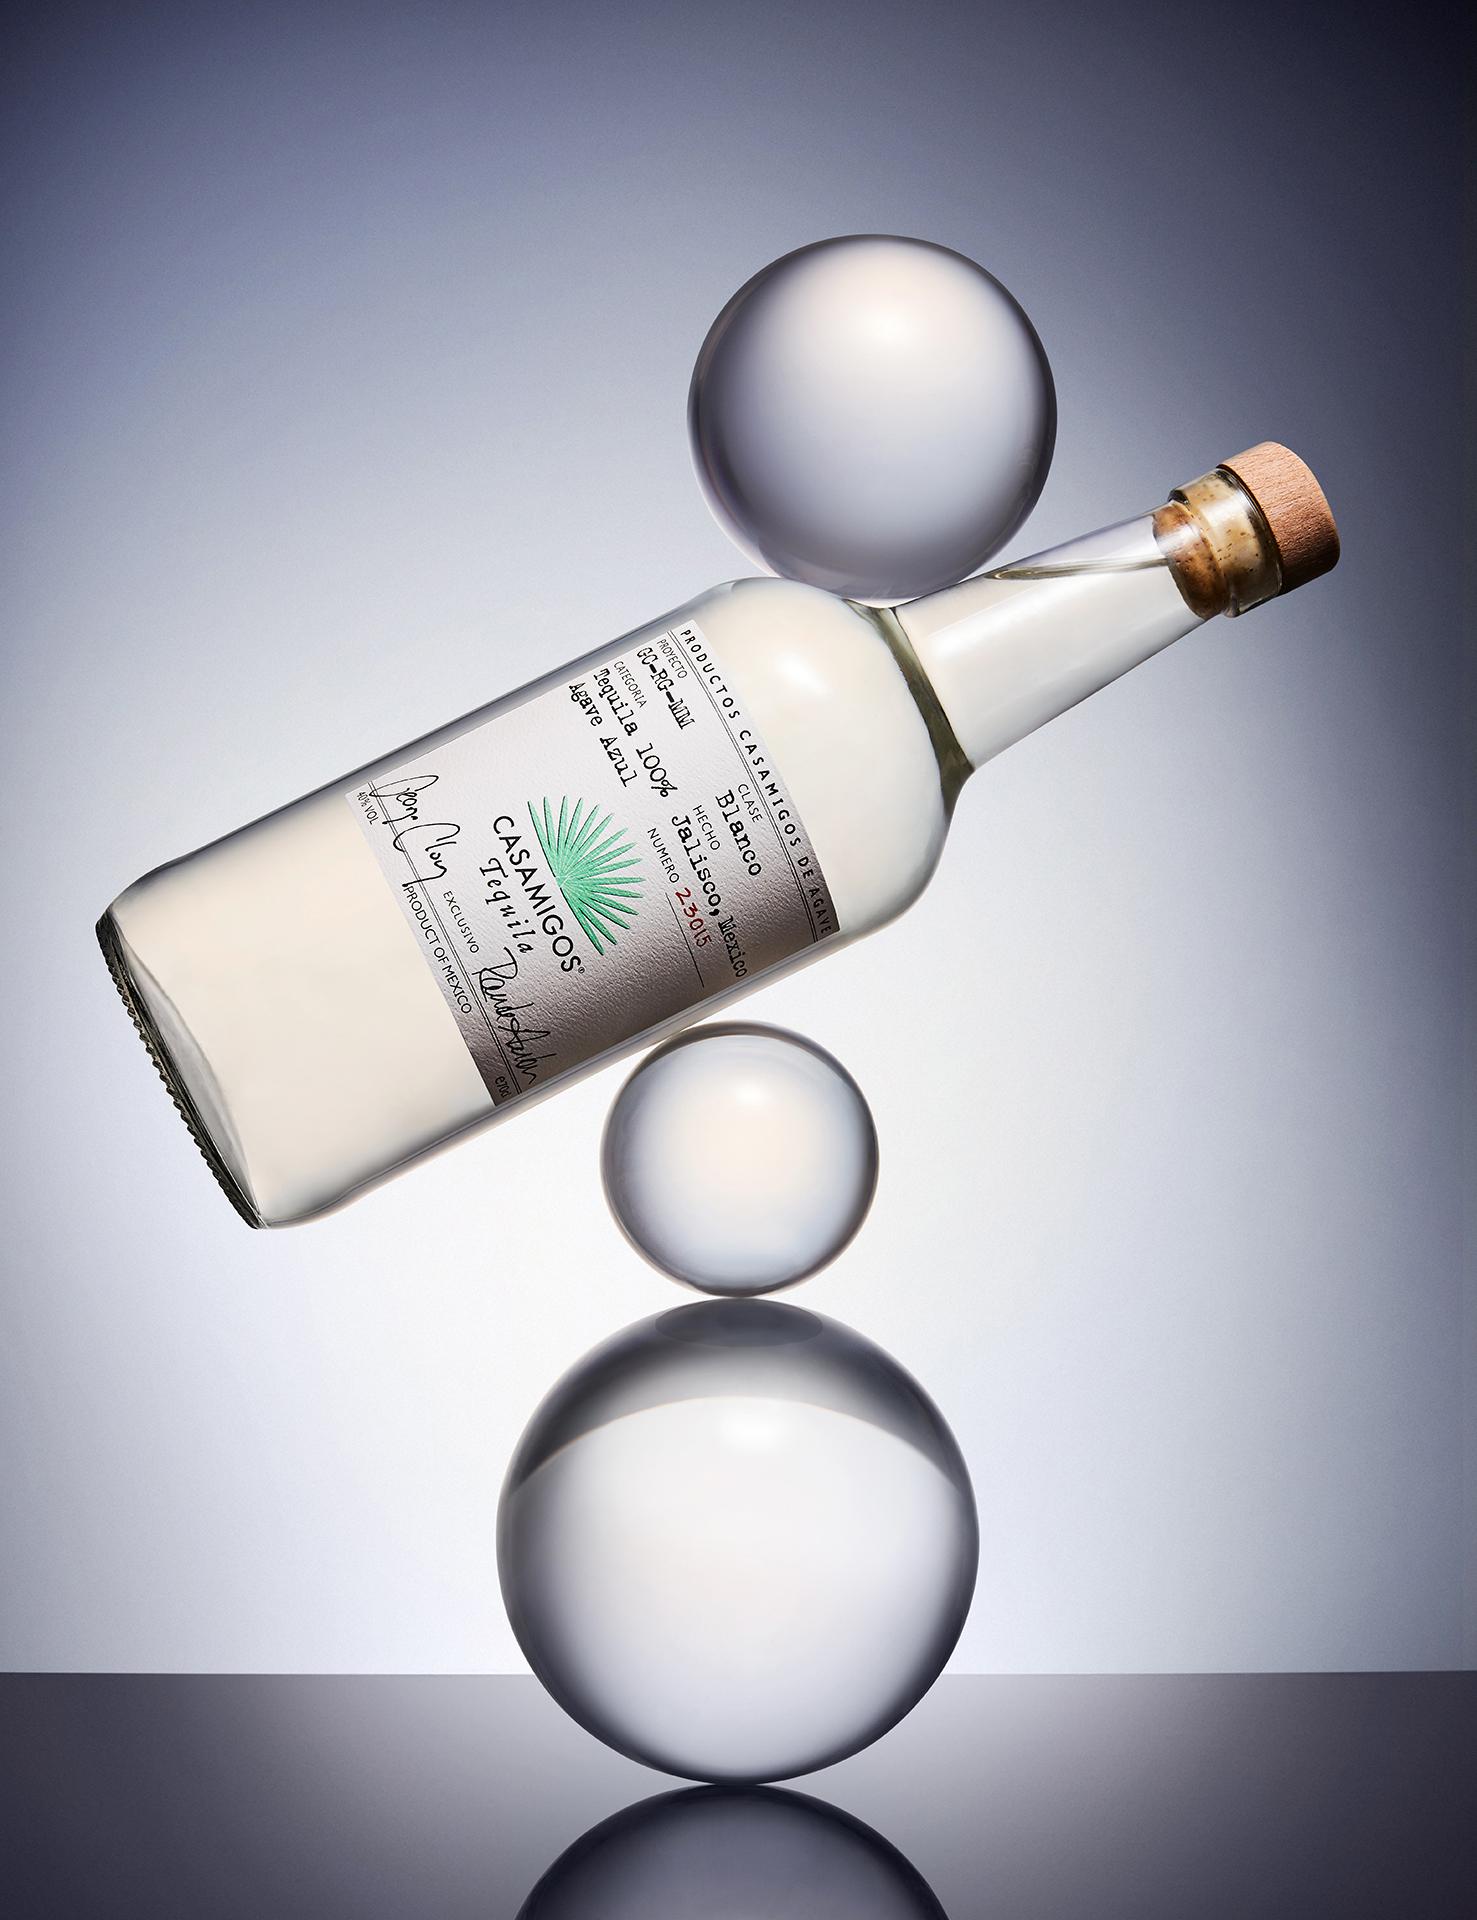 alcohol-photography-still-life-glass-crystal-ball-balace-impossible-josh-caudwell-2.jpg